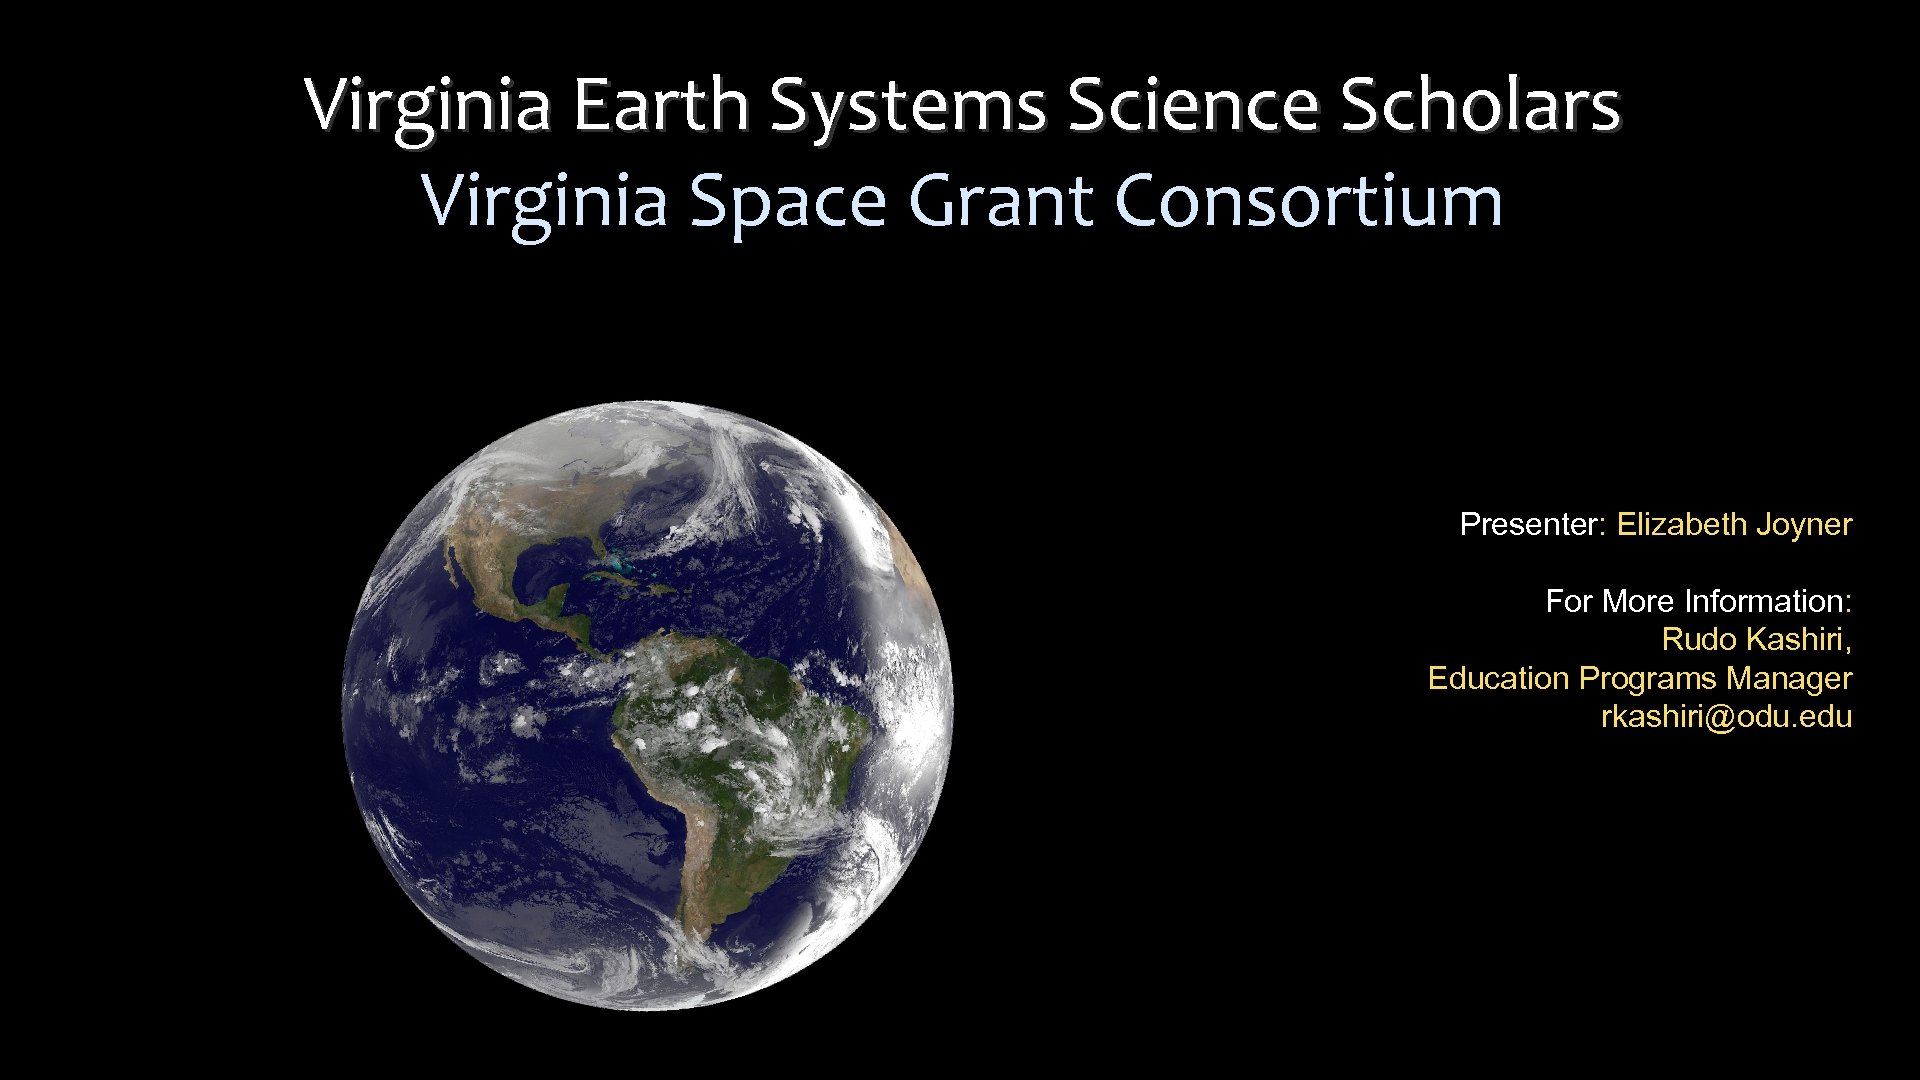 Virginia Earth Systems Science Scholars Virginia Space Grant Consortium Presenter: Elizabeth Joyner For More